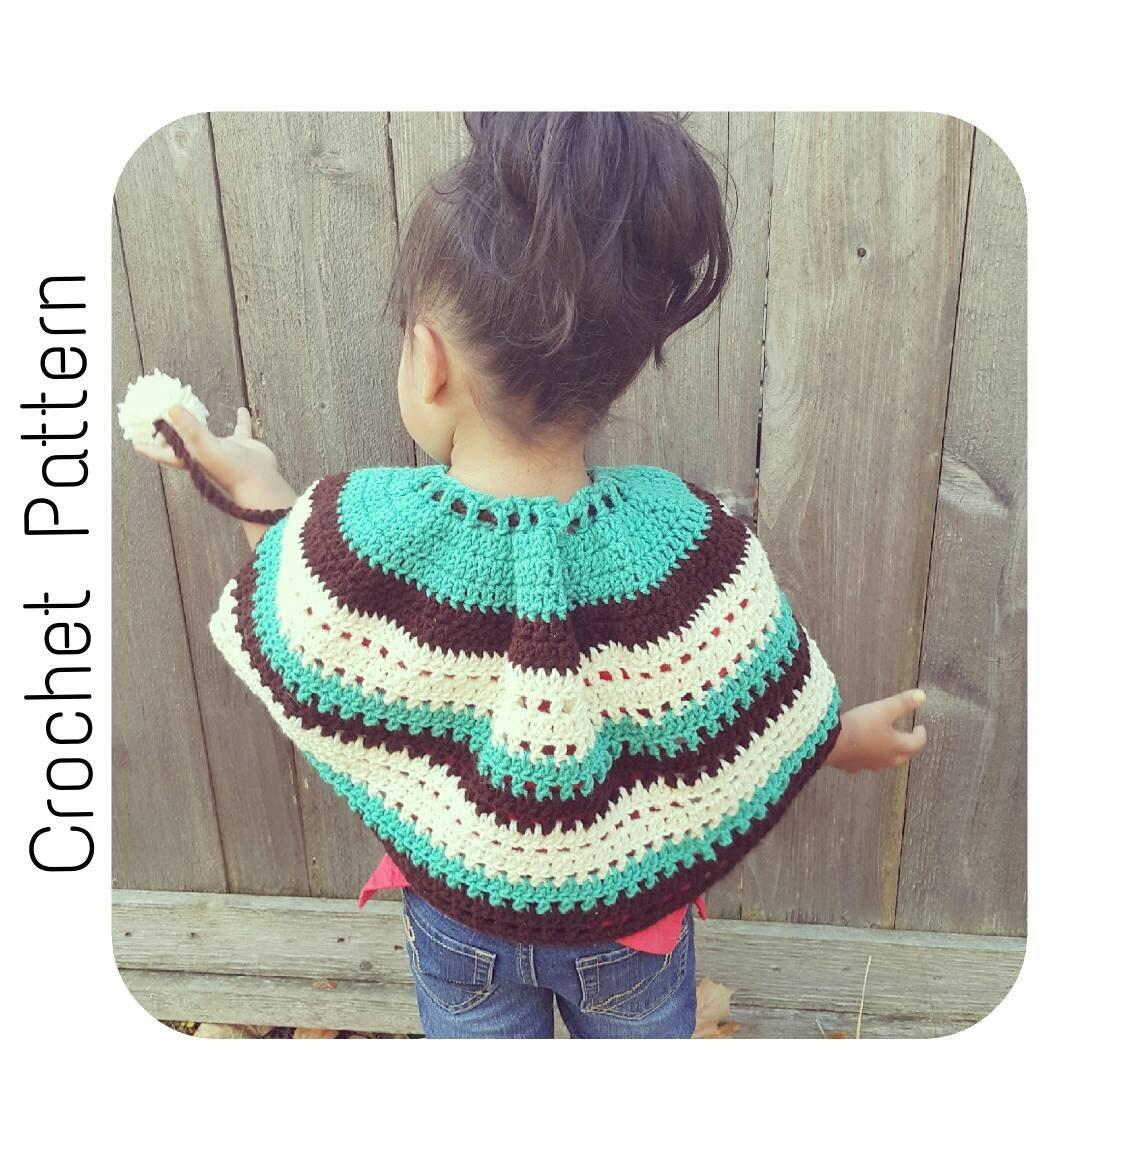 Serendipityasalways On Twitter Crochet Pattern Girls Poncho